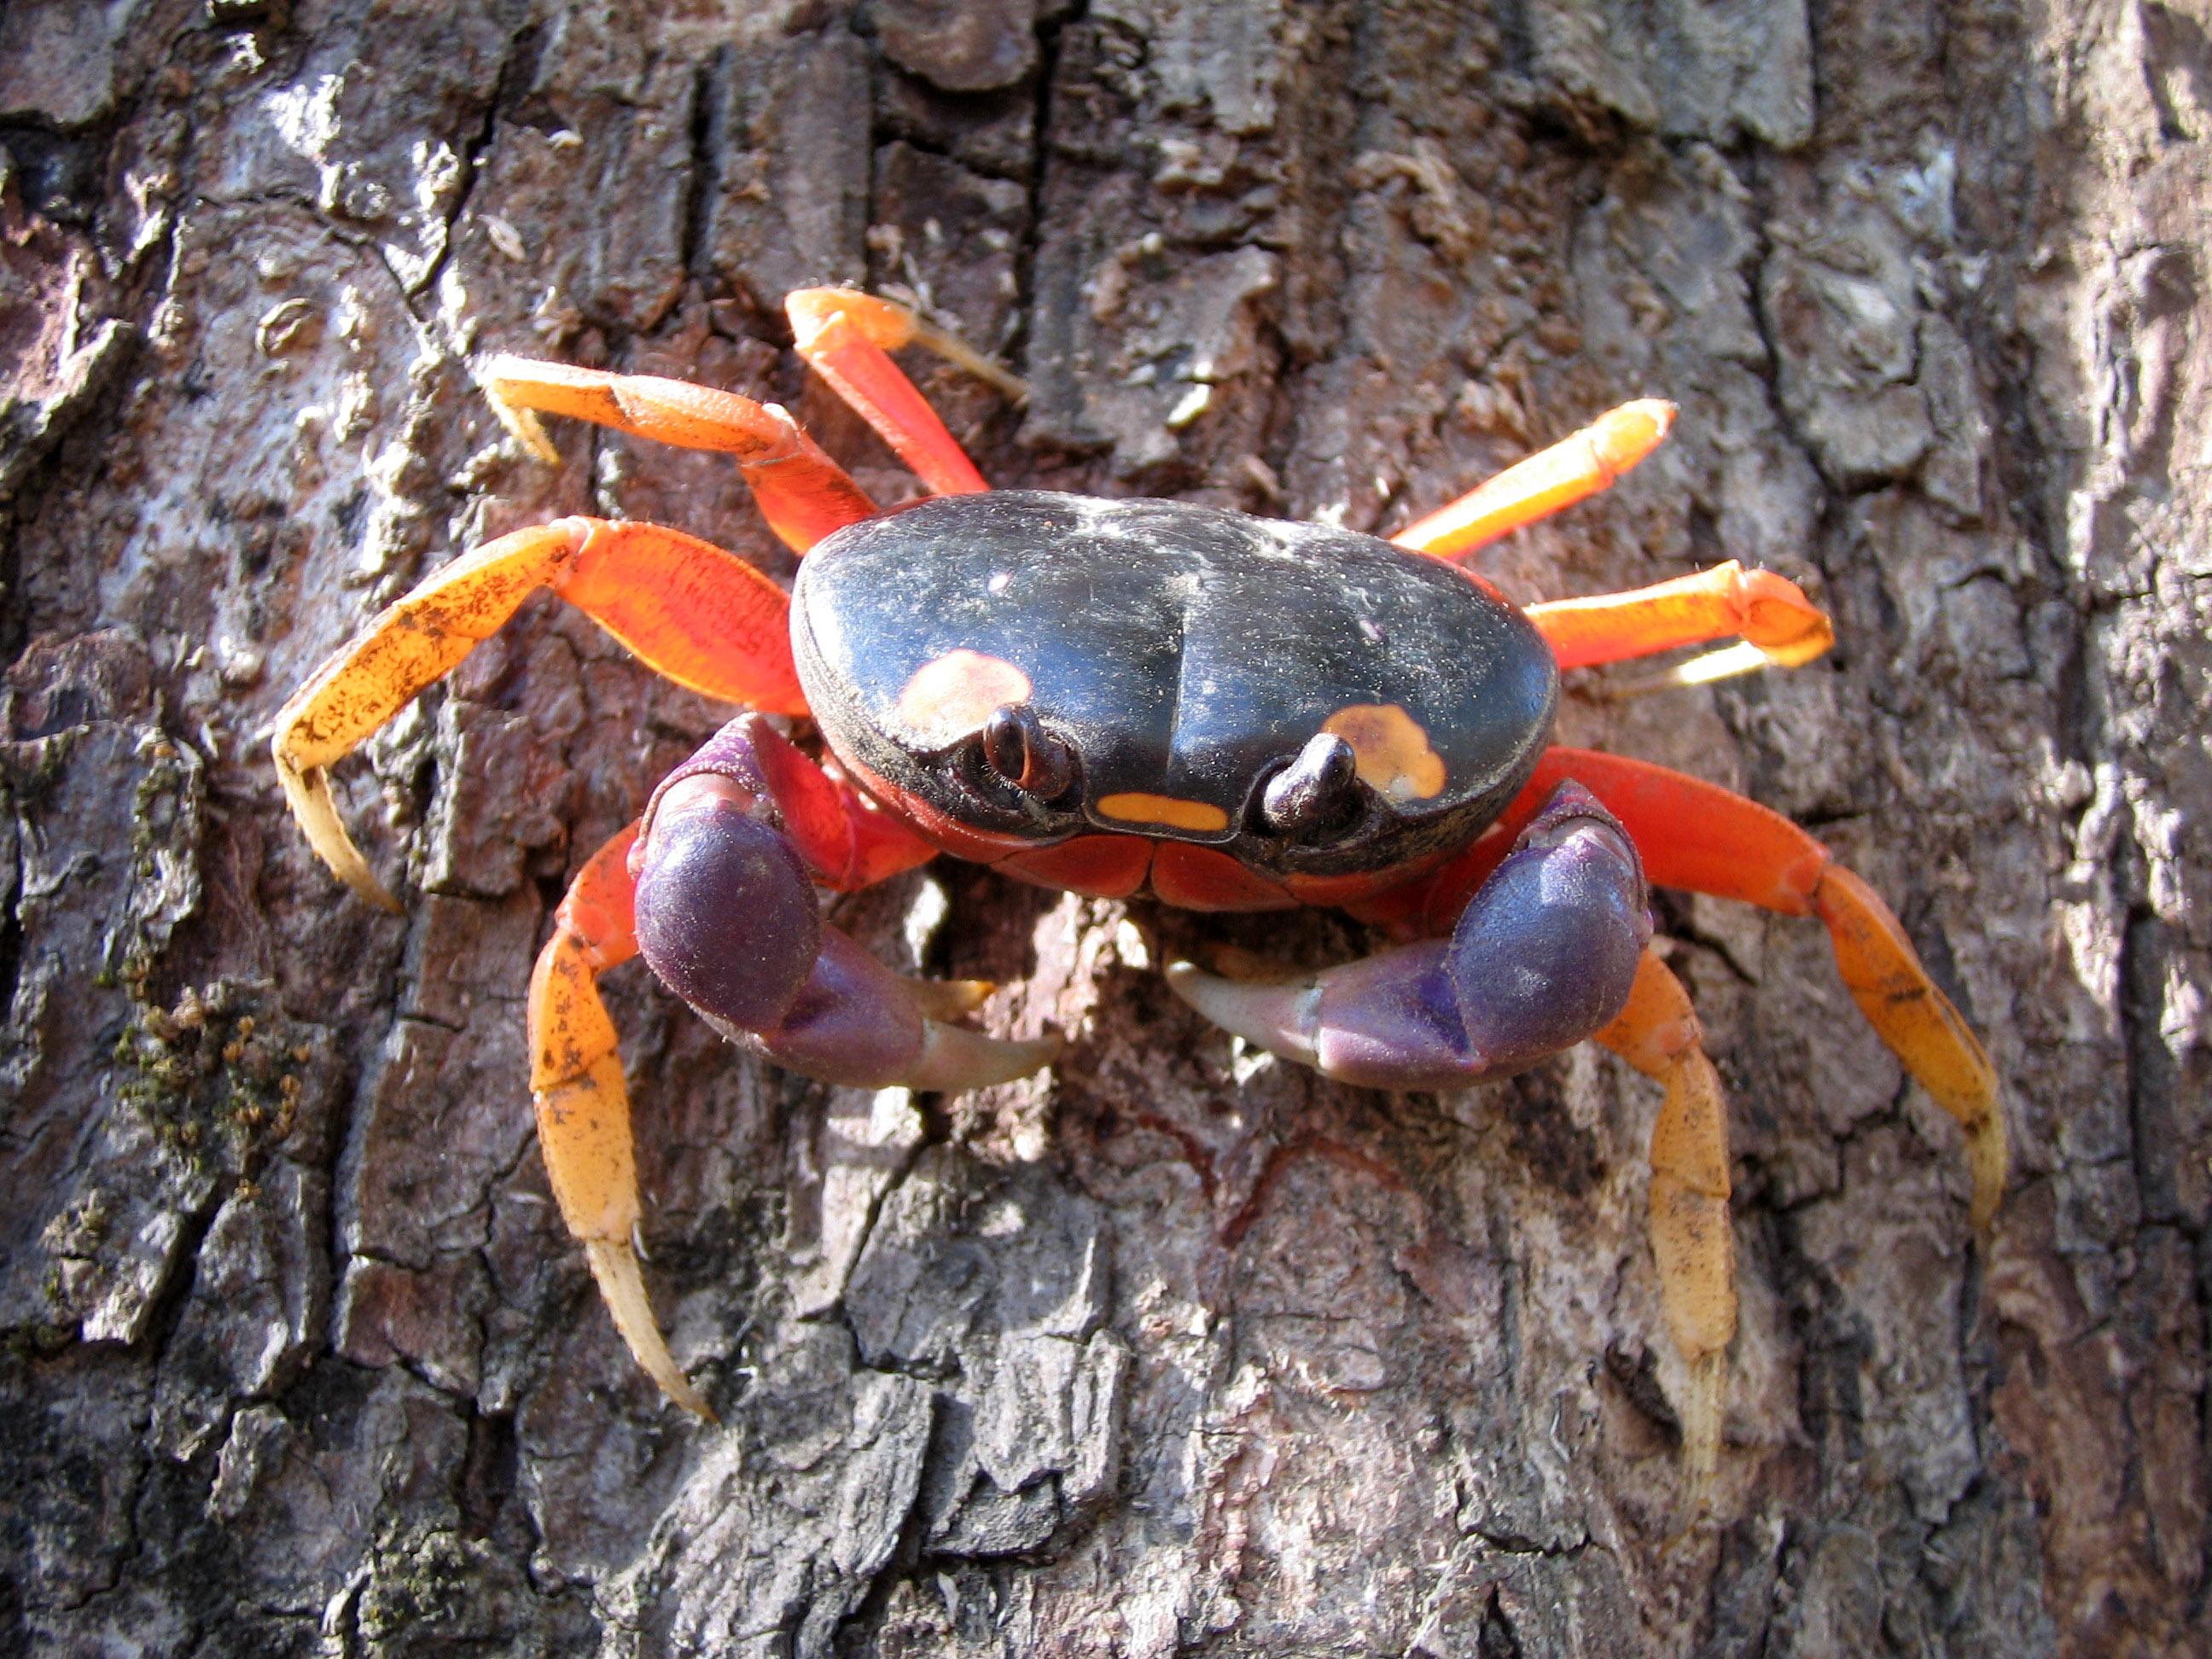 Marine Halloween: Crabs Dress Up To Trick-or-Treat